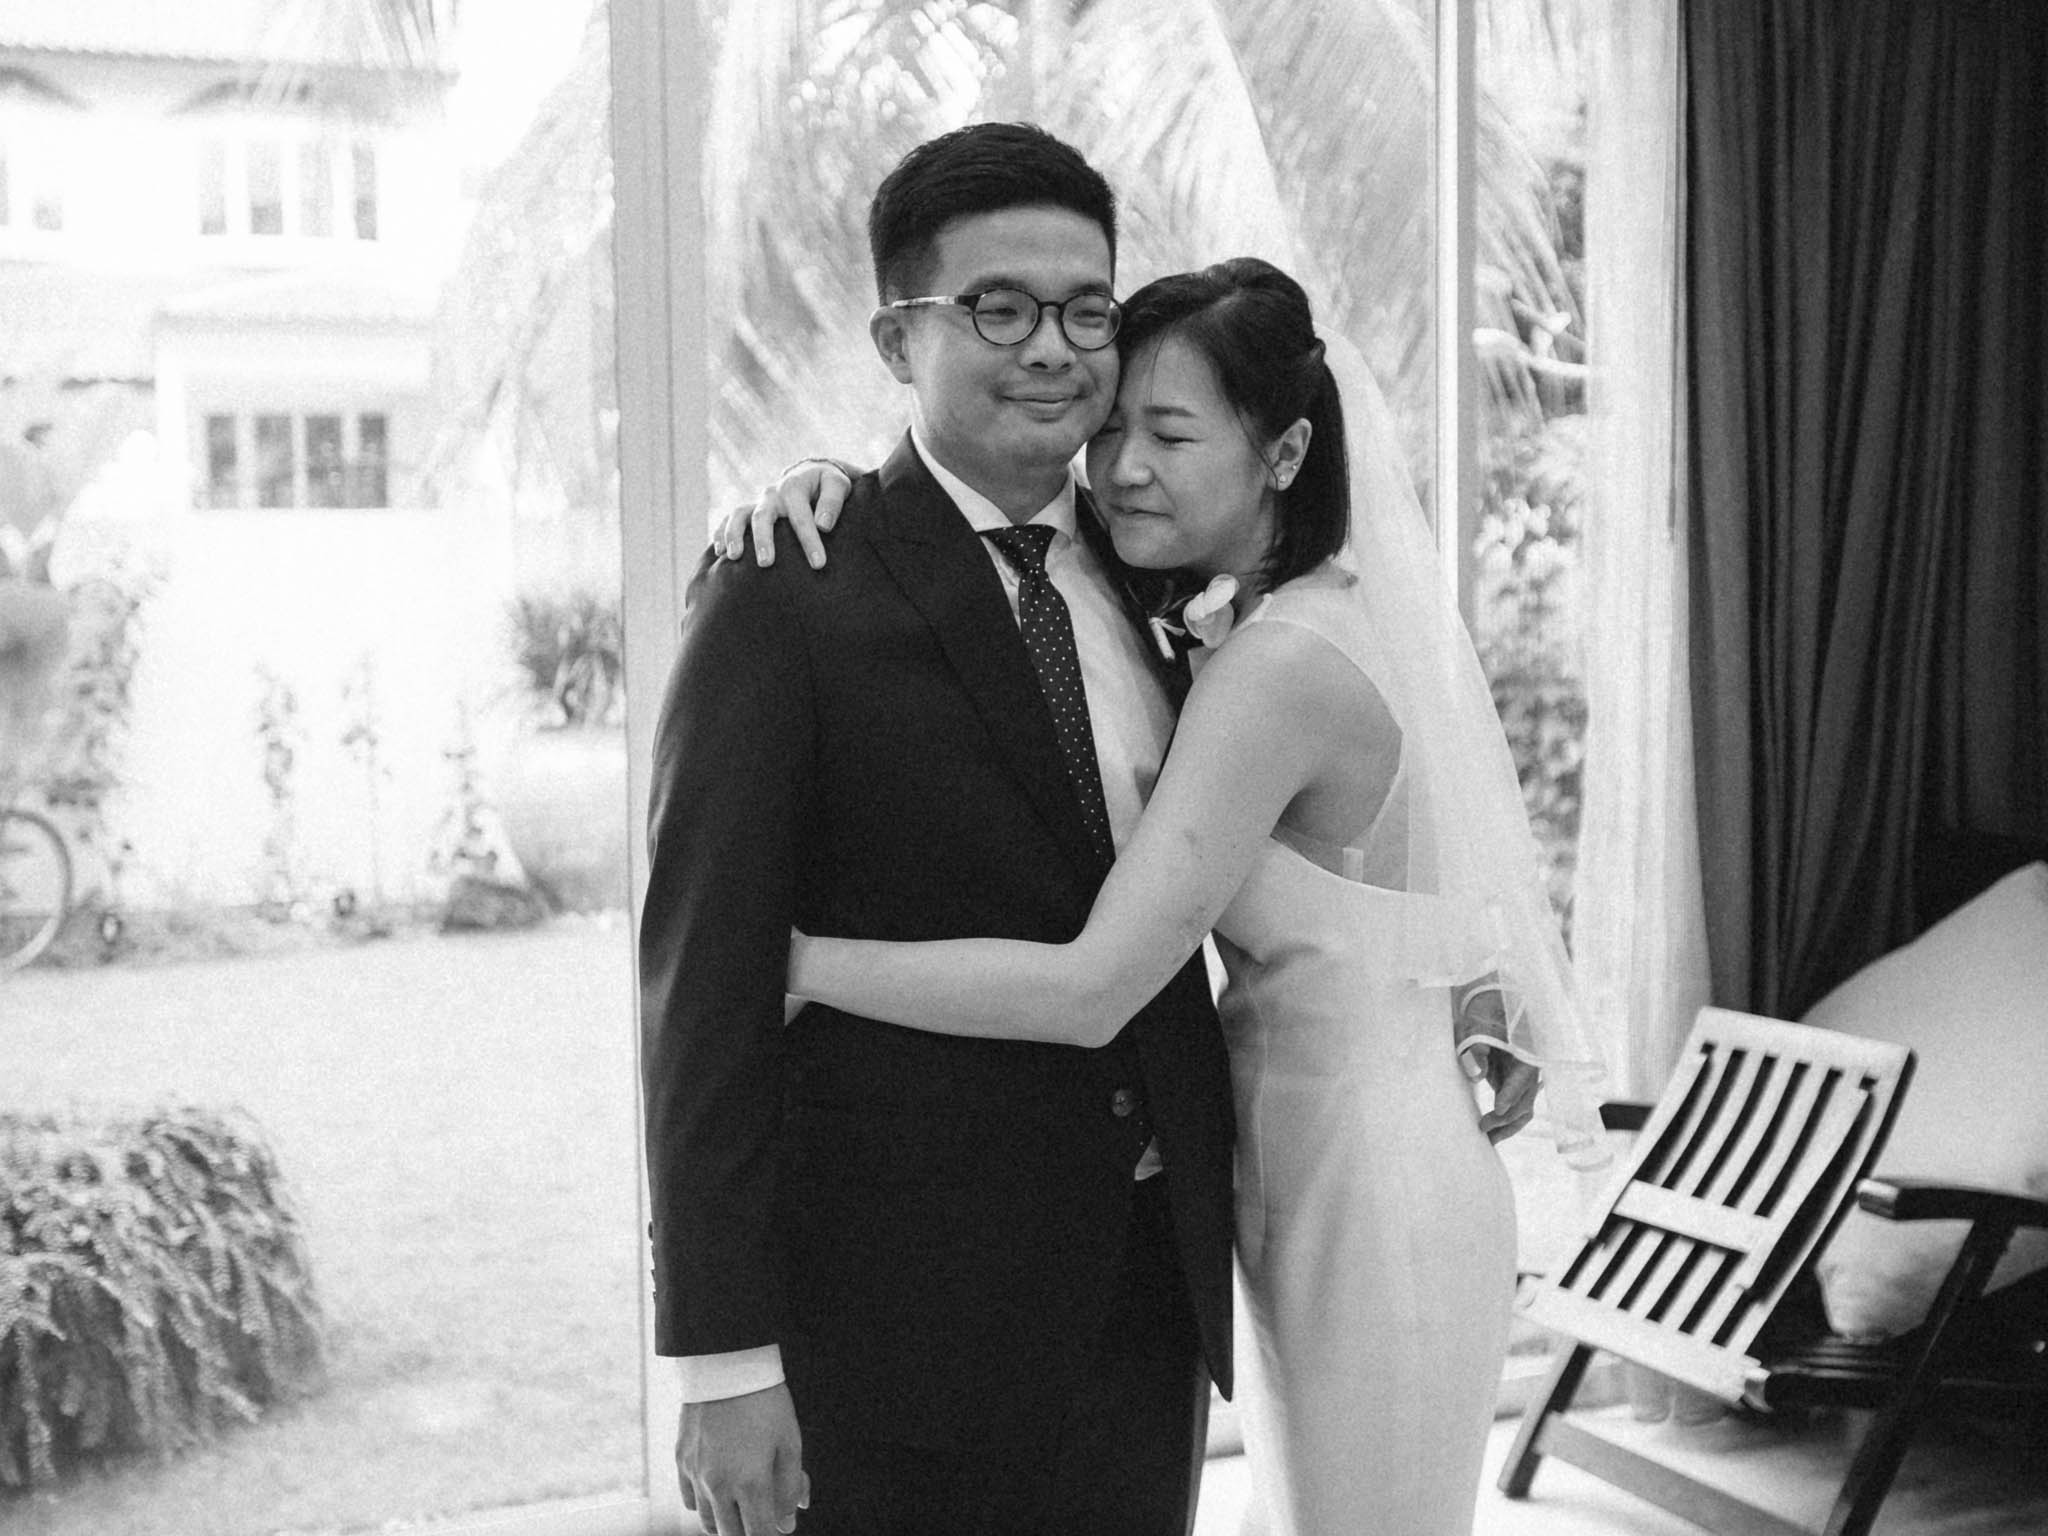 singapore-wedding-photographer-sentosa-foc-mark-eleanor-40.jpg